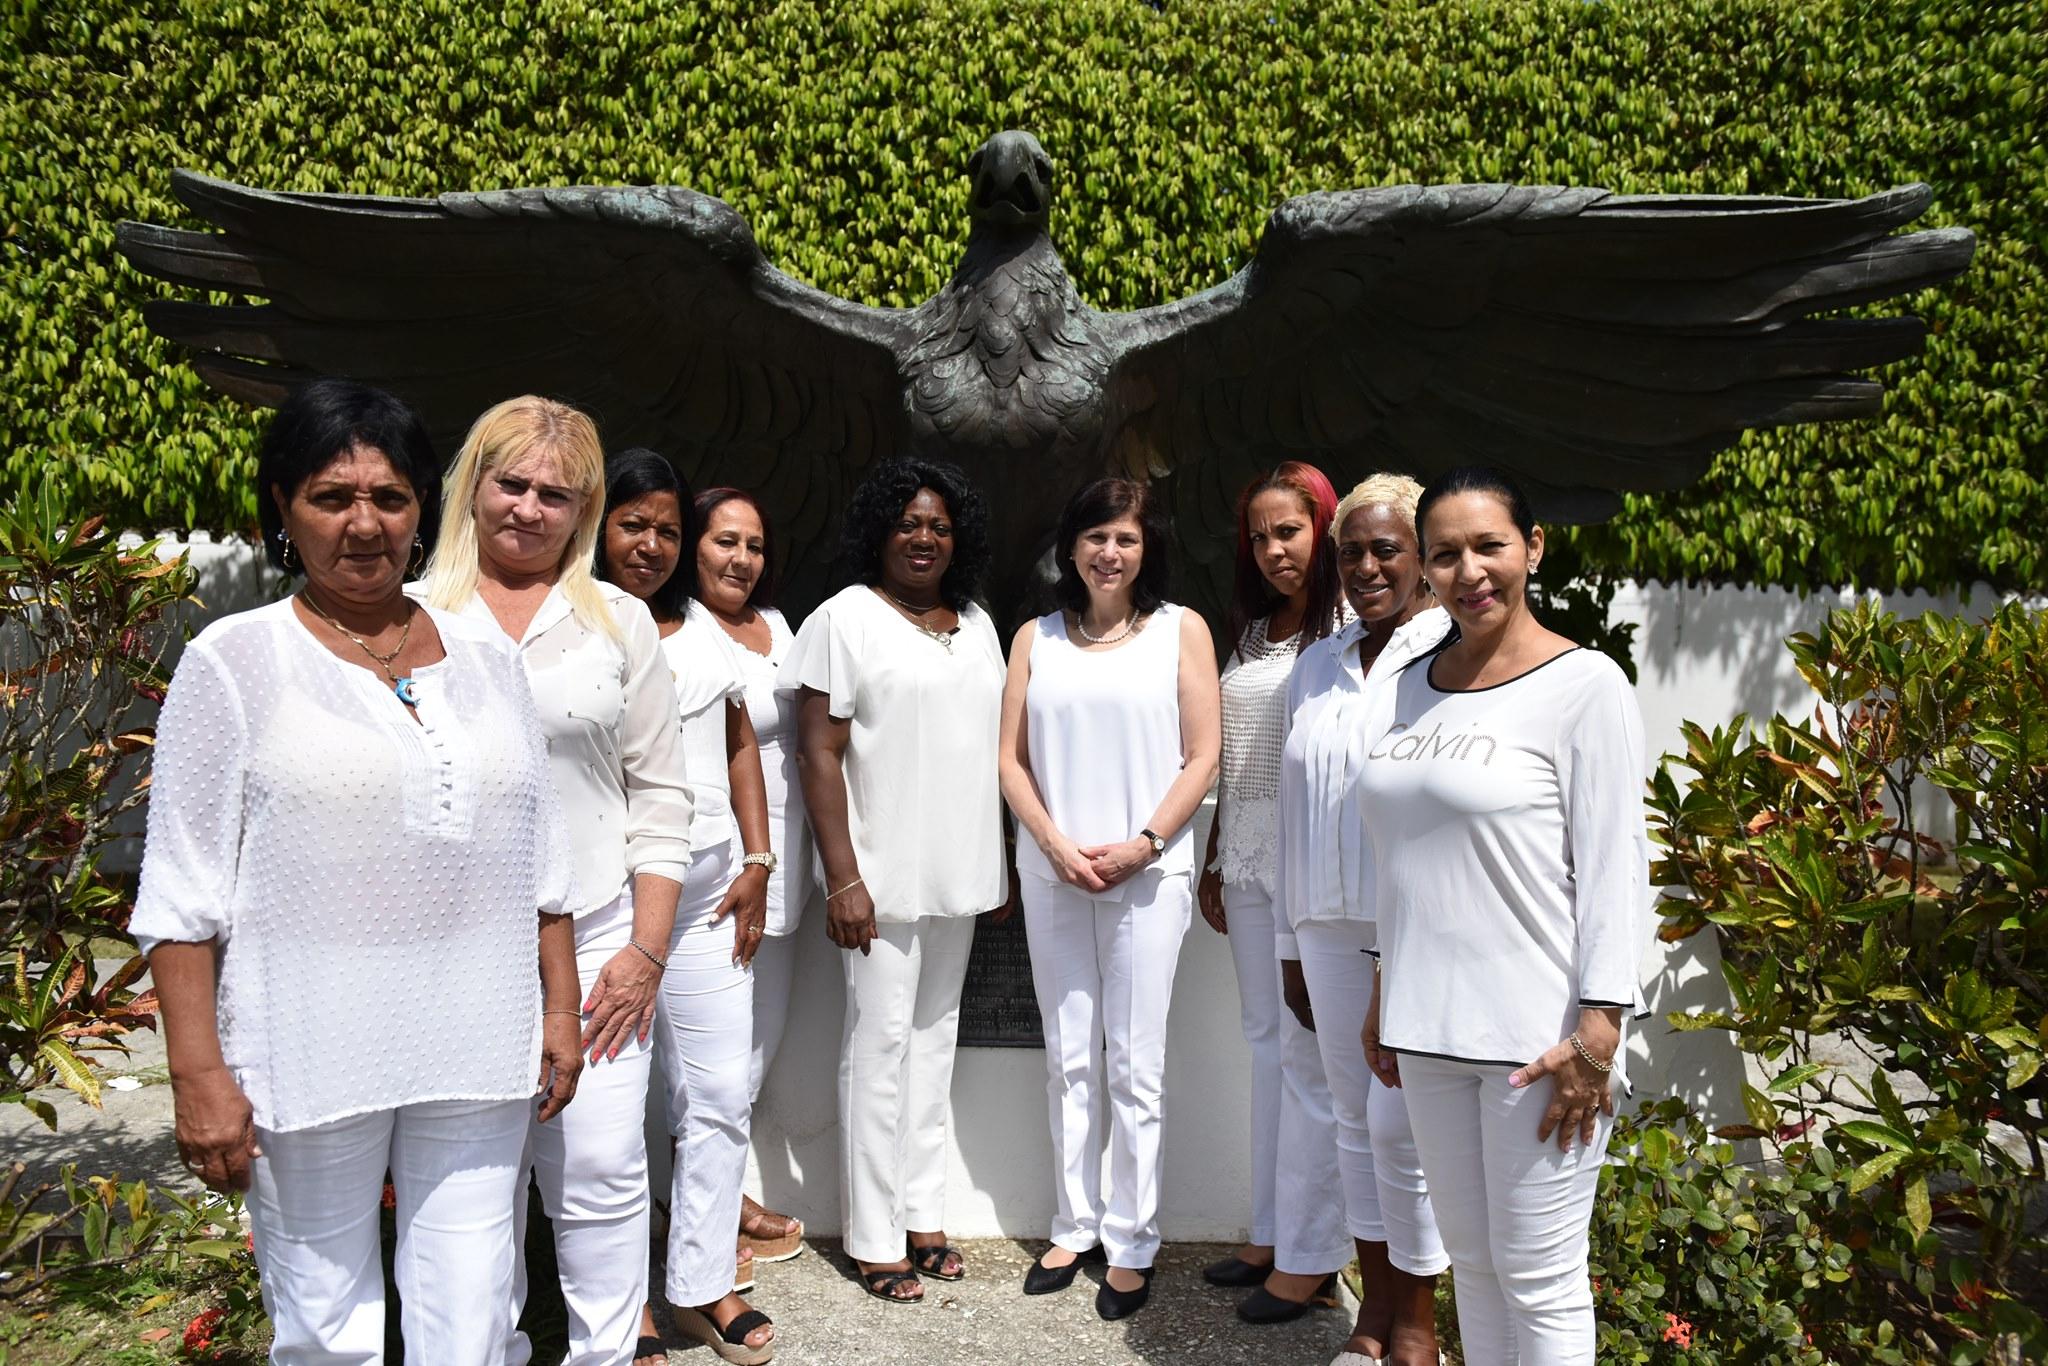 Damas de blanca